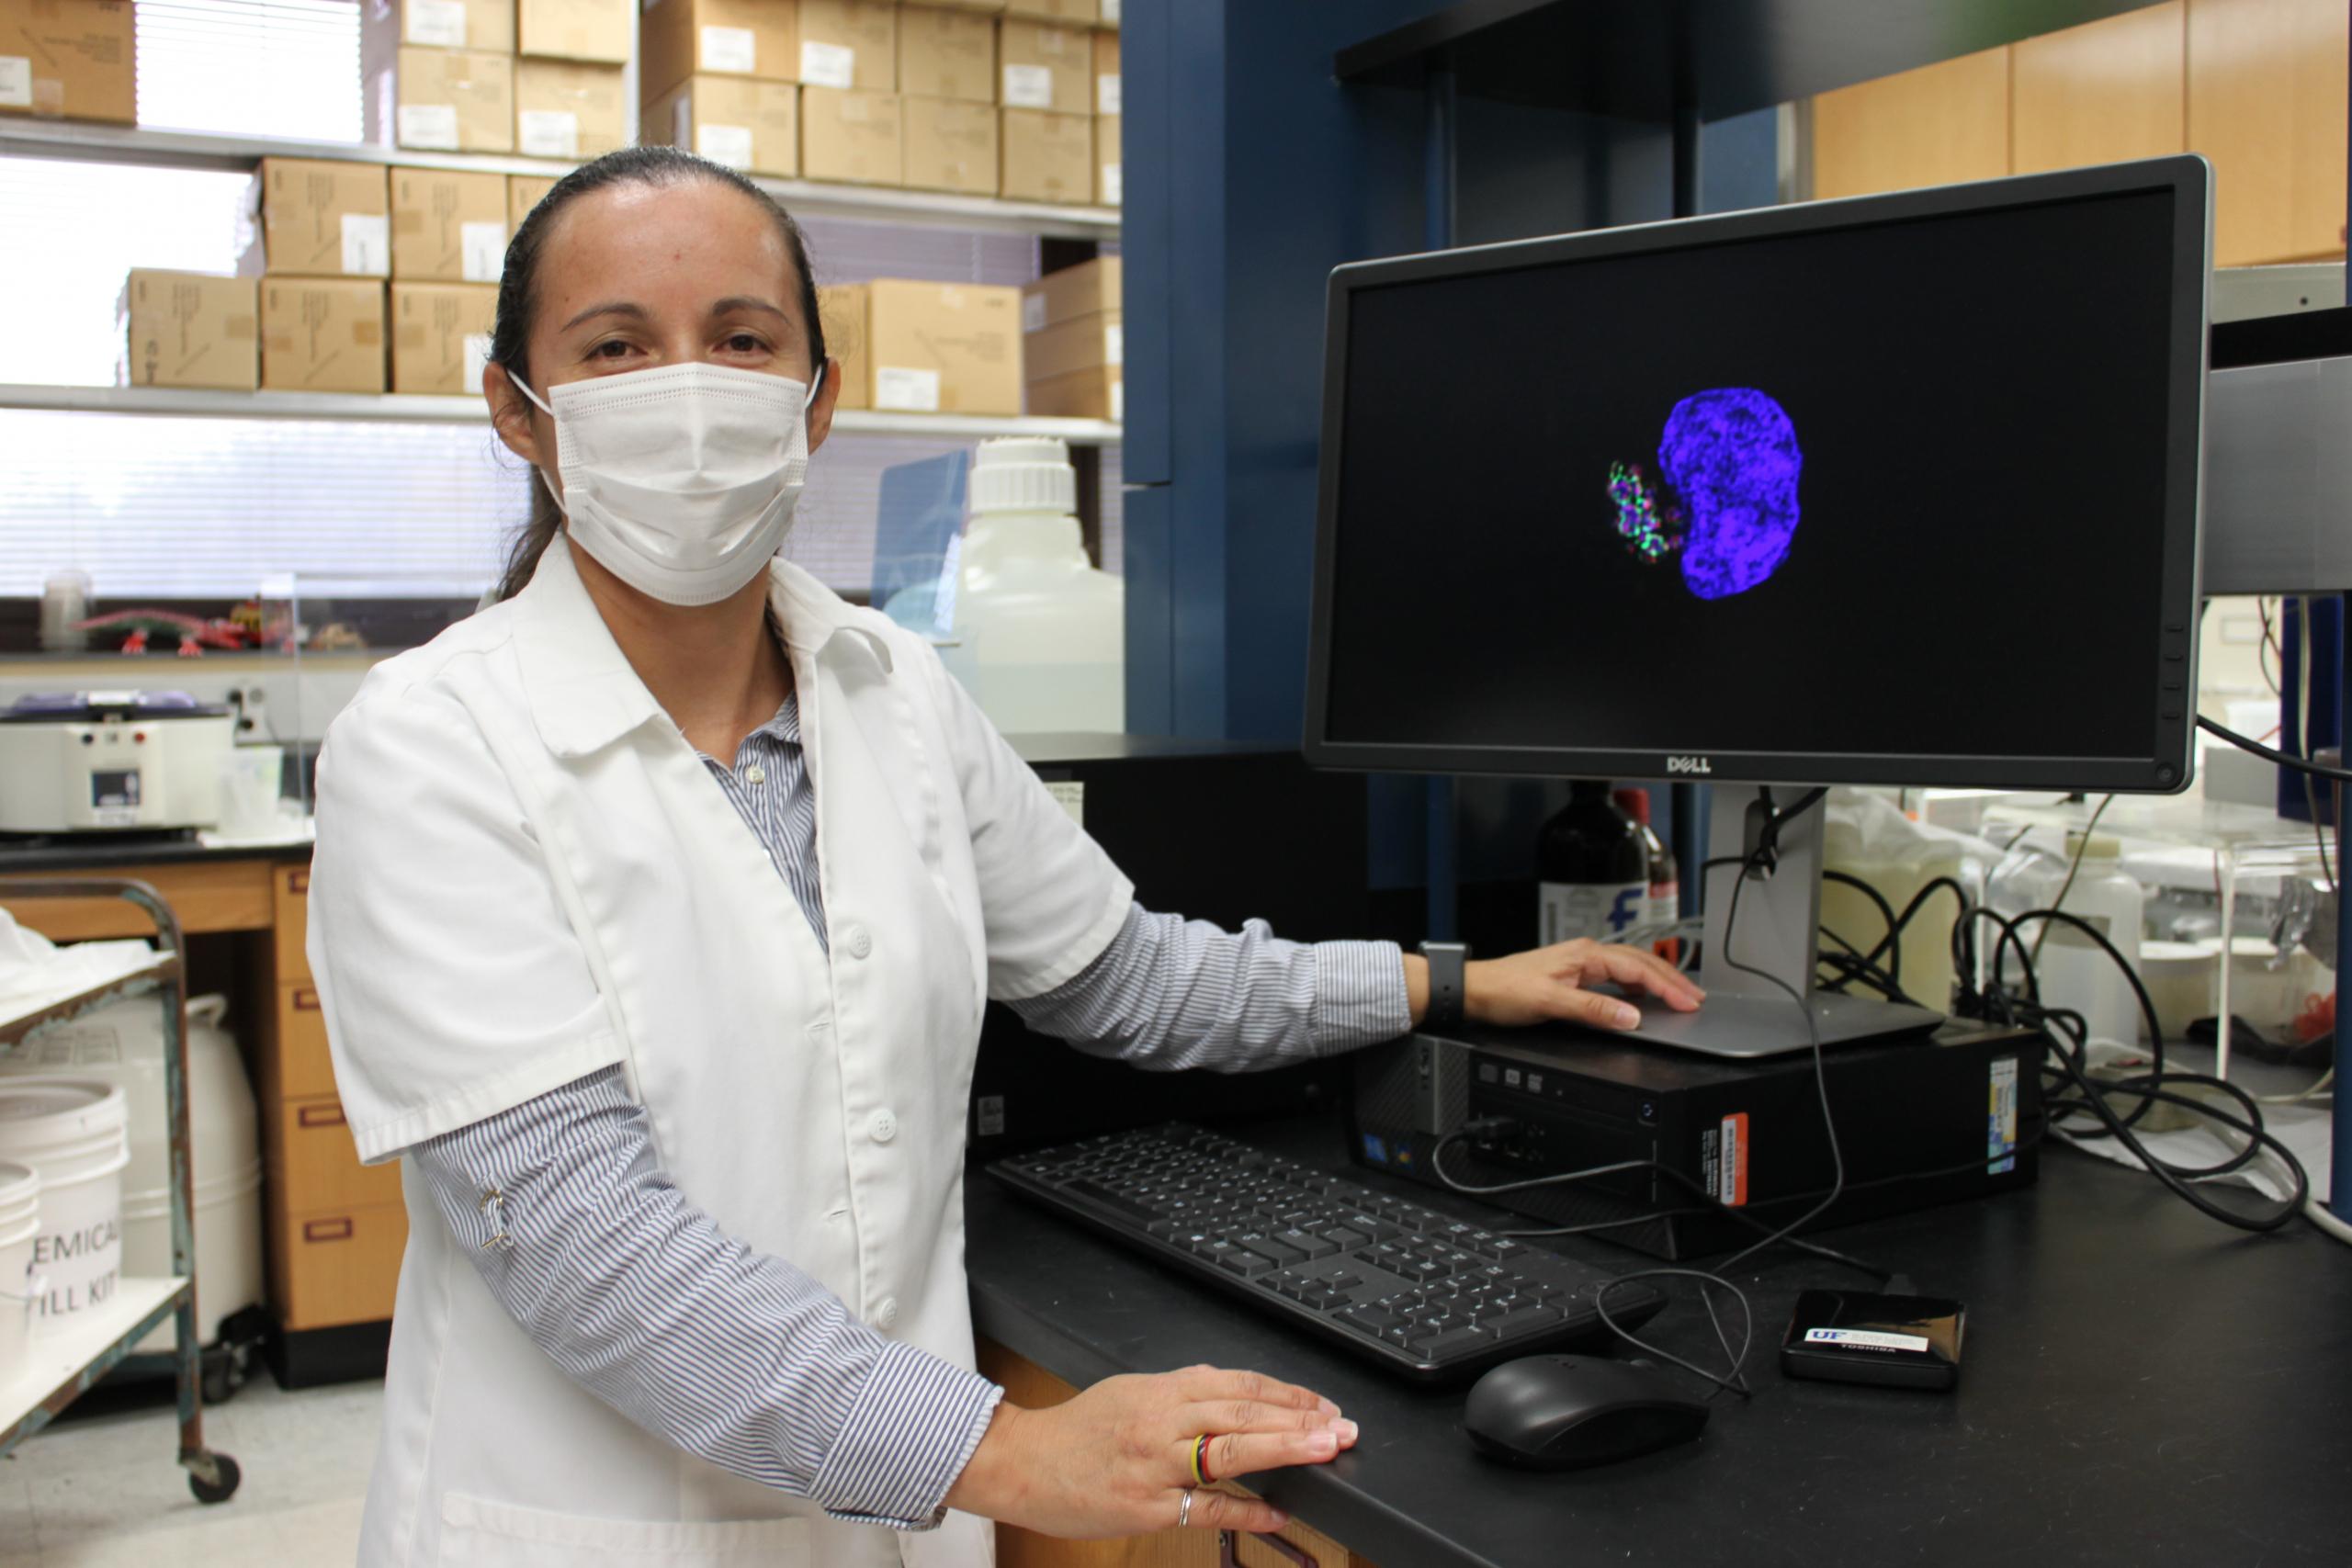 Dr. Francy Crosby